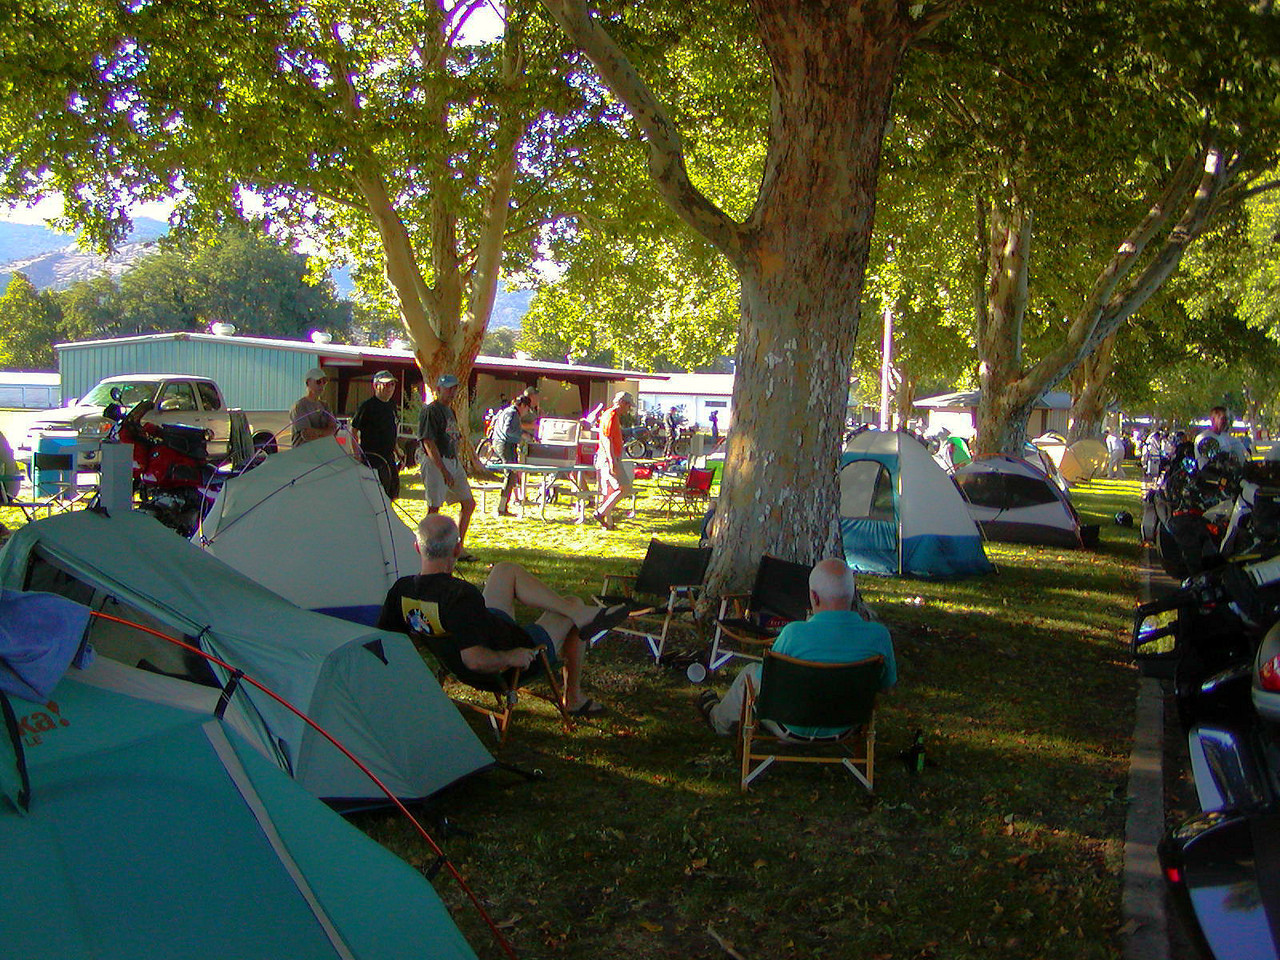 Siskiyou Fairgrounds in Yreka